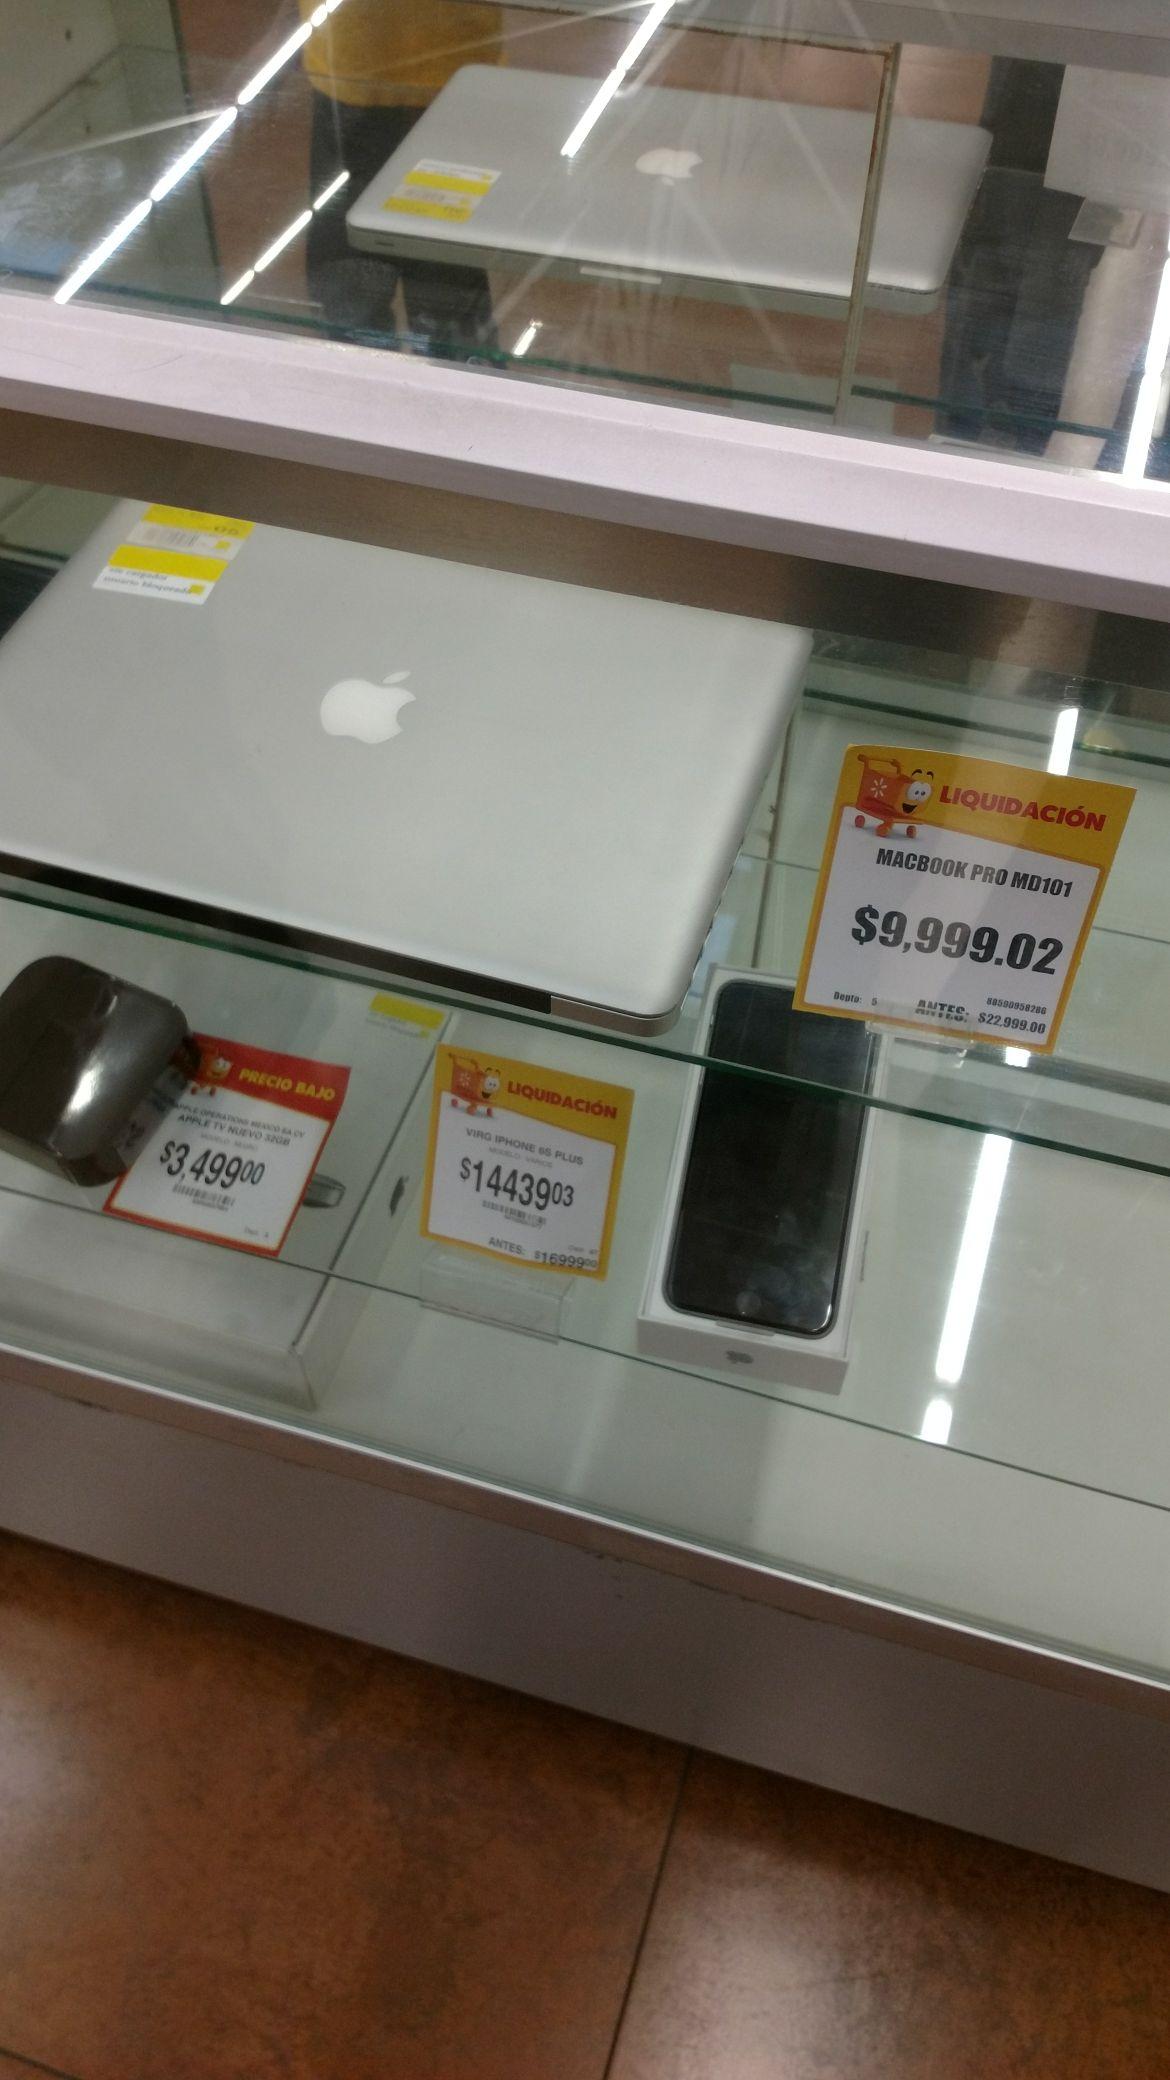 Walmart: Macbook PRO 13.3 mid101 a $9,999.02